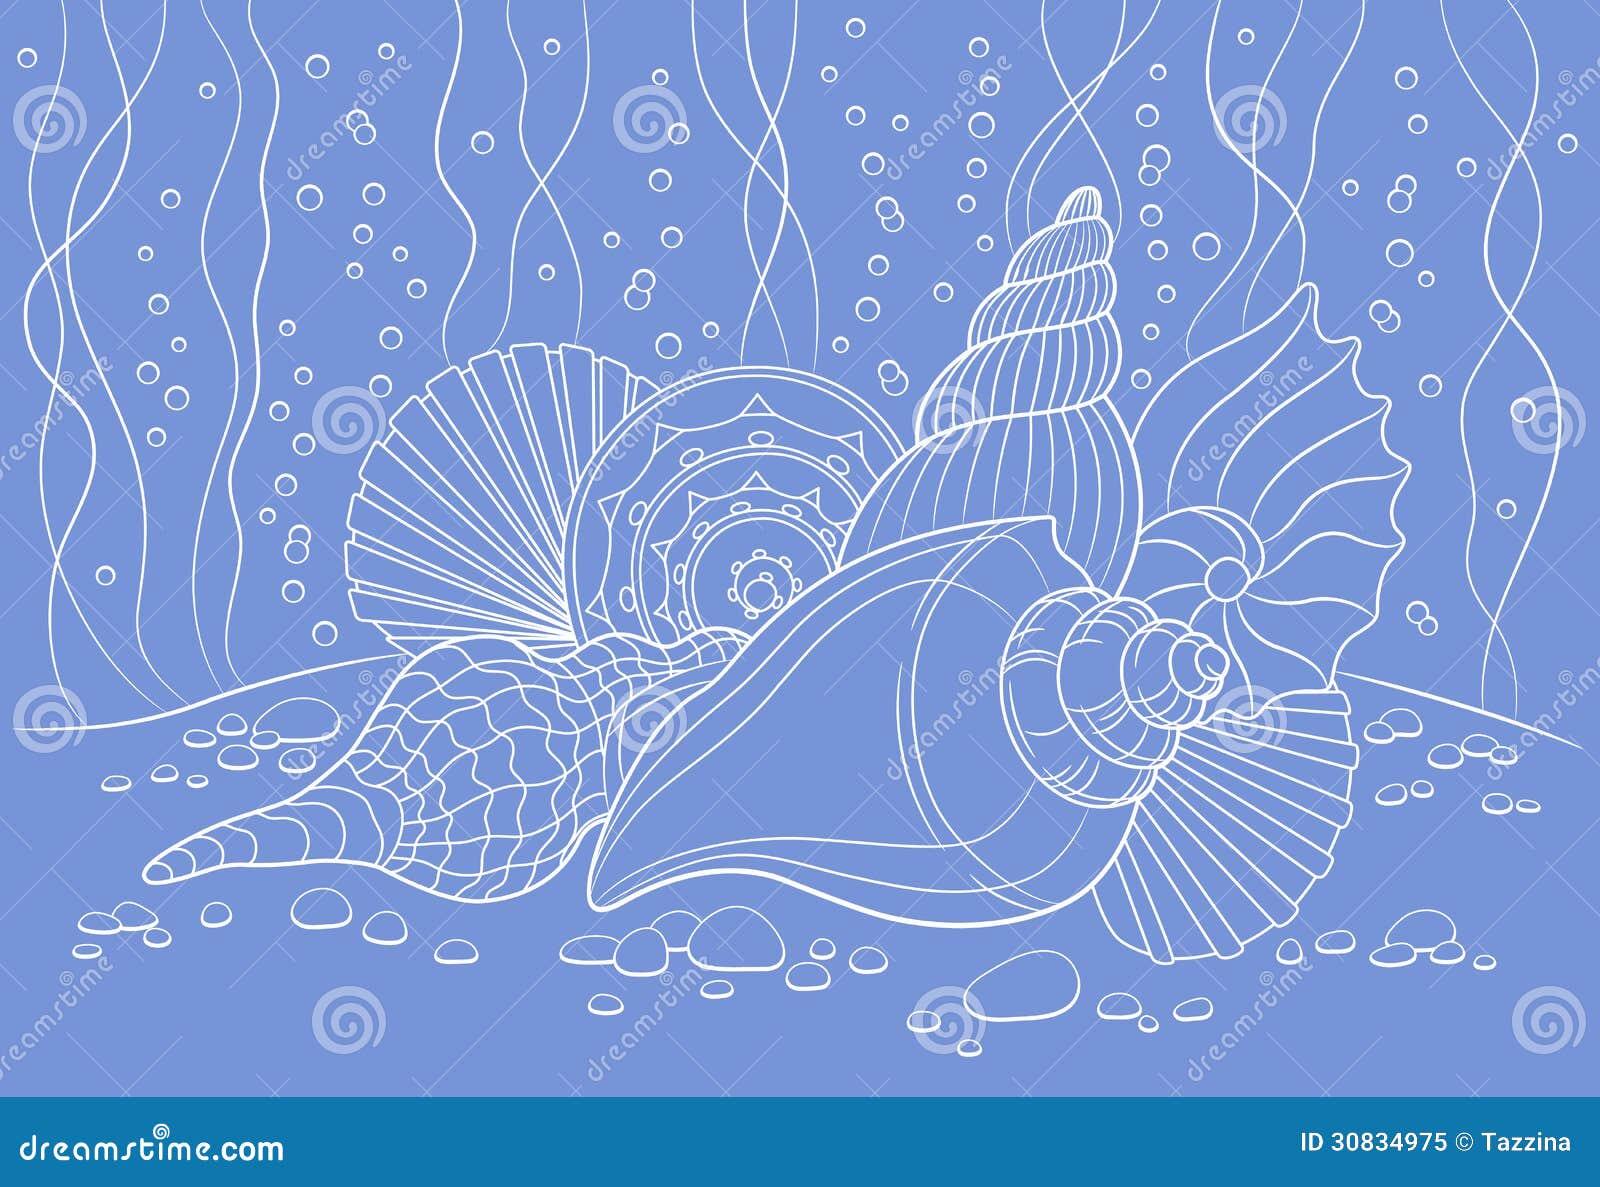 Vector Illustration Web Designs: Seashells Stock Vector. Illustration Of Cruise, Pattern